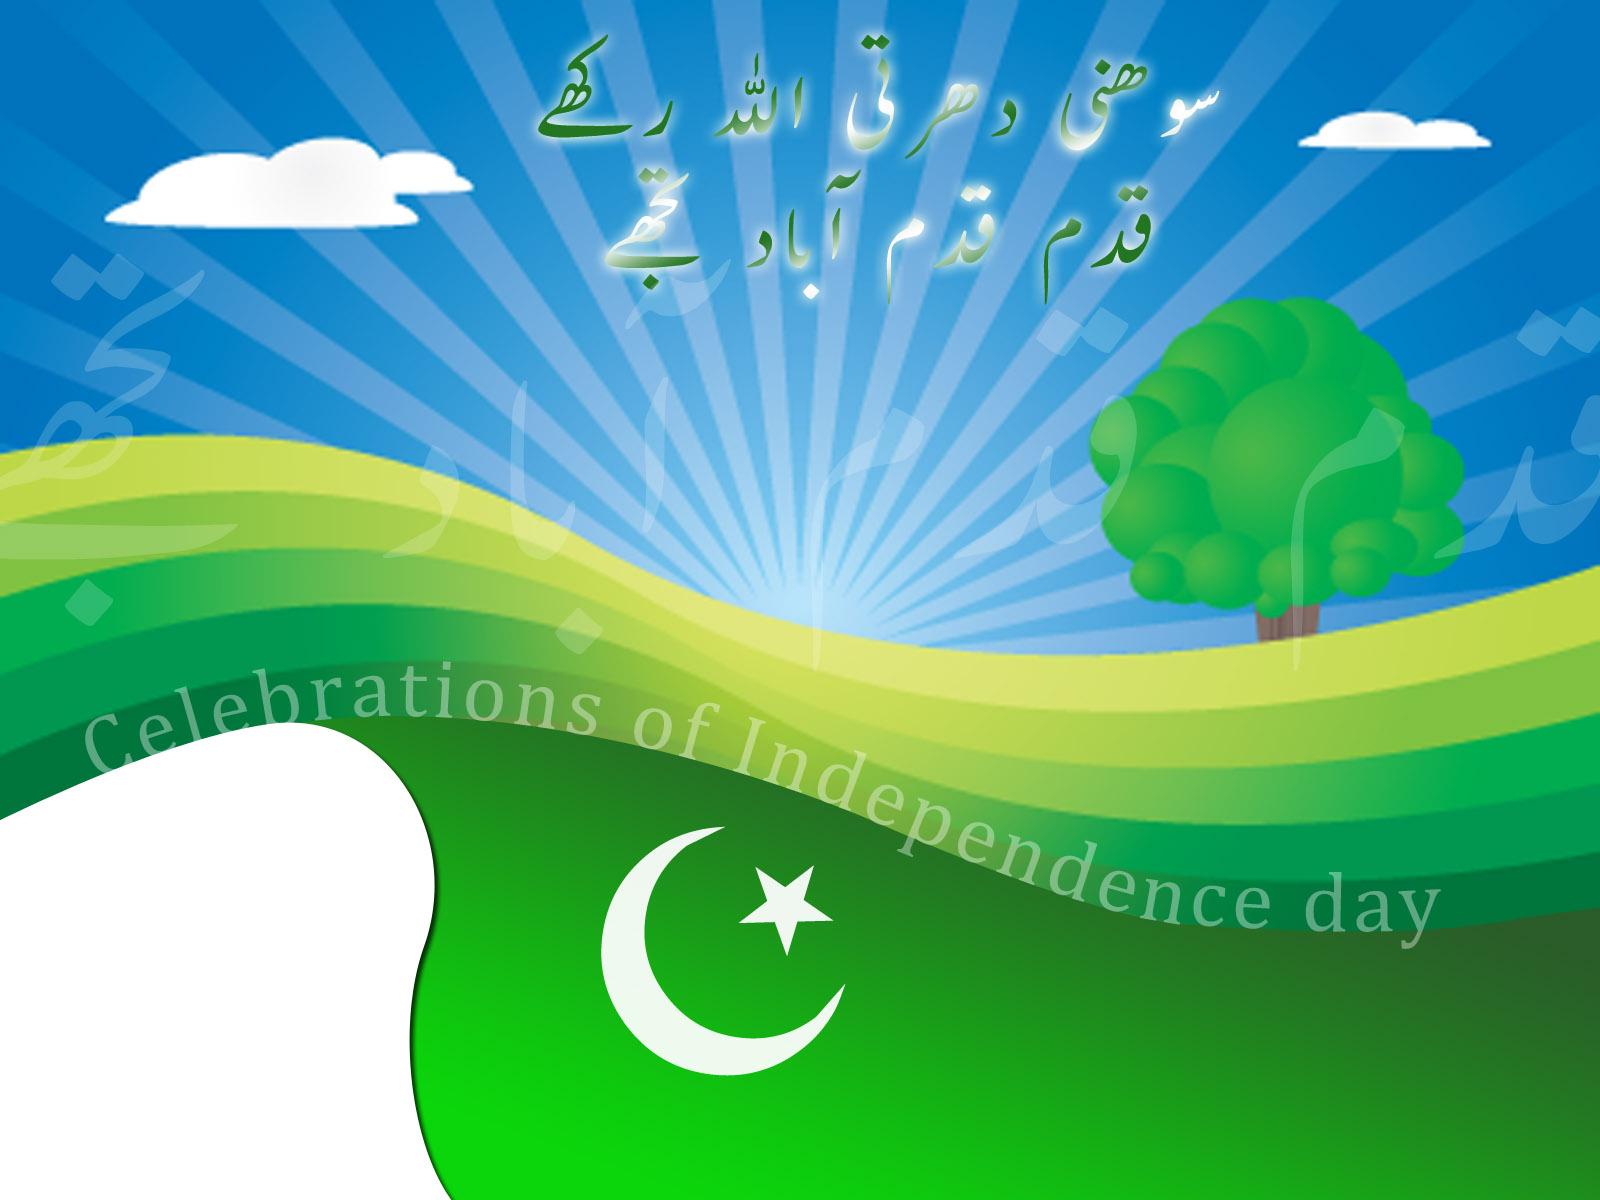 http://1.bp.blogspot.com/-fTTHClEuyUw/TkbTpwVwQKI/AAAAAAAAPbA/qpDjHGTB2J8/s1600/14+August+Pakistan+Indefendence+Day+card+greeting+psupero+%25283%2529.jpg